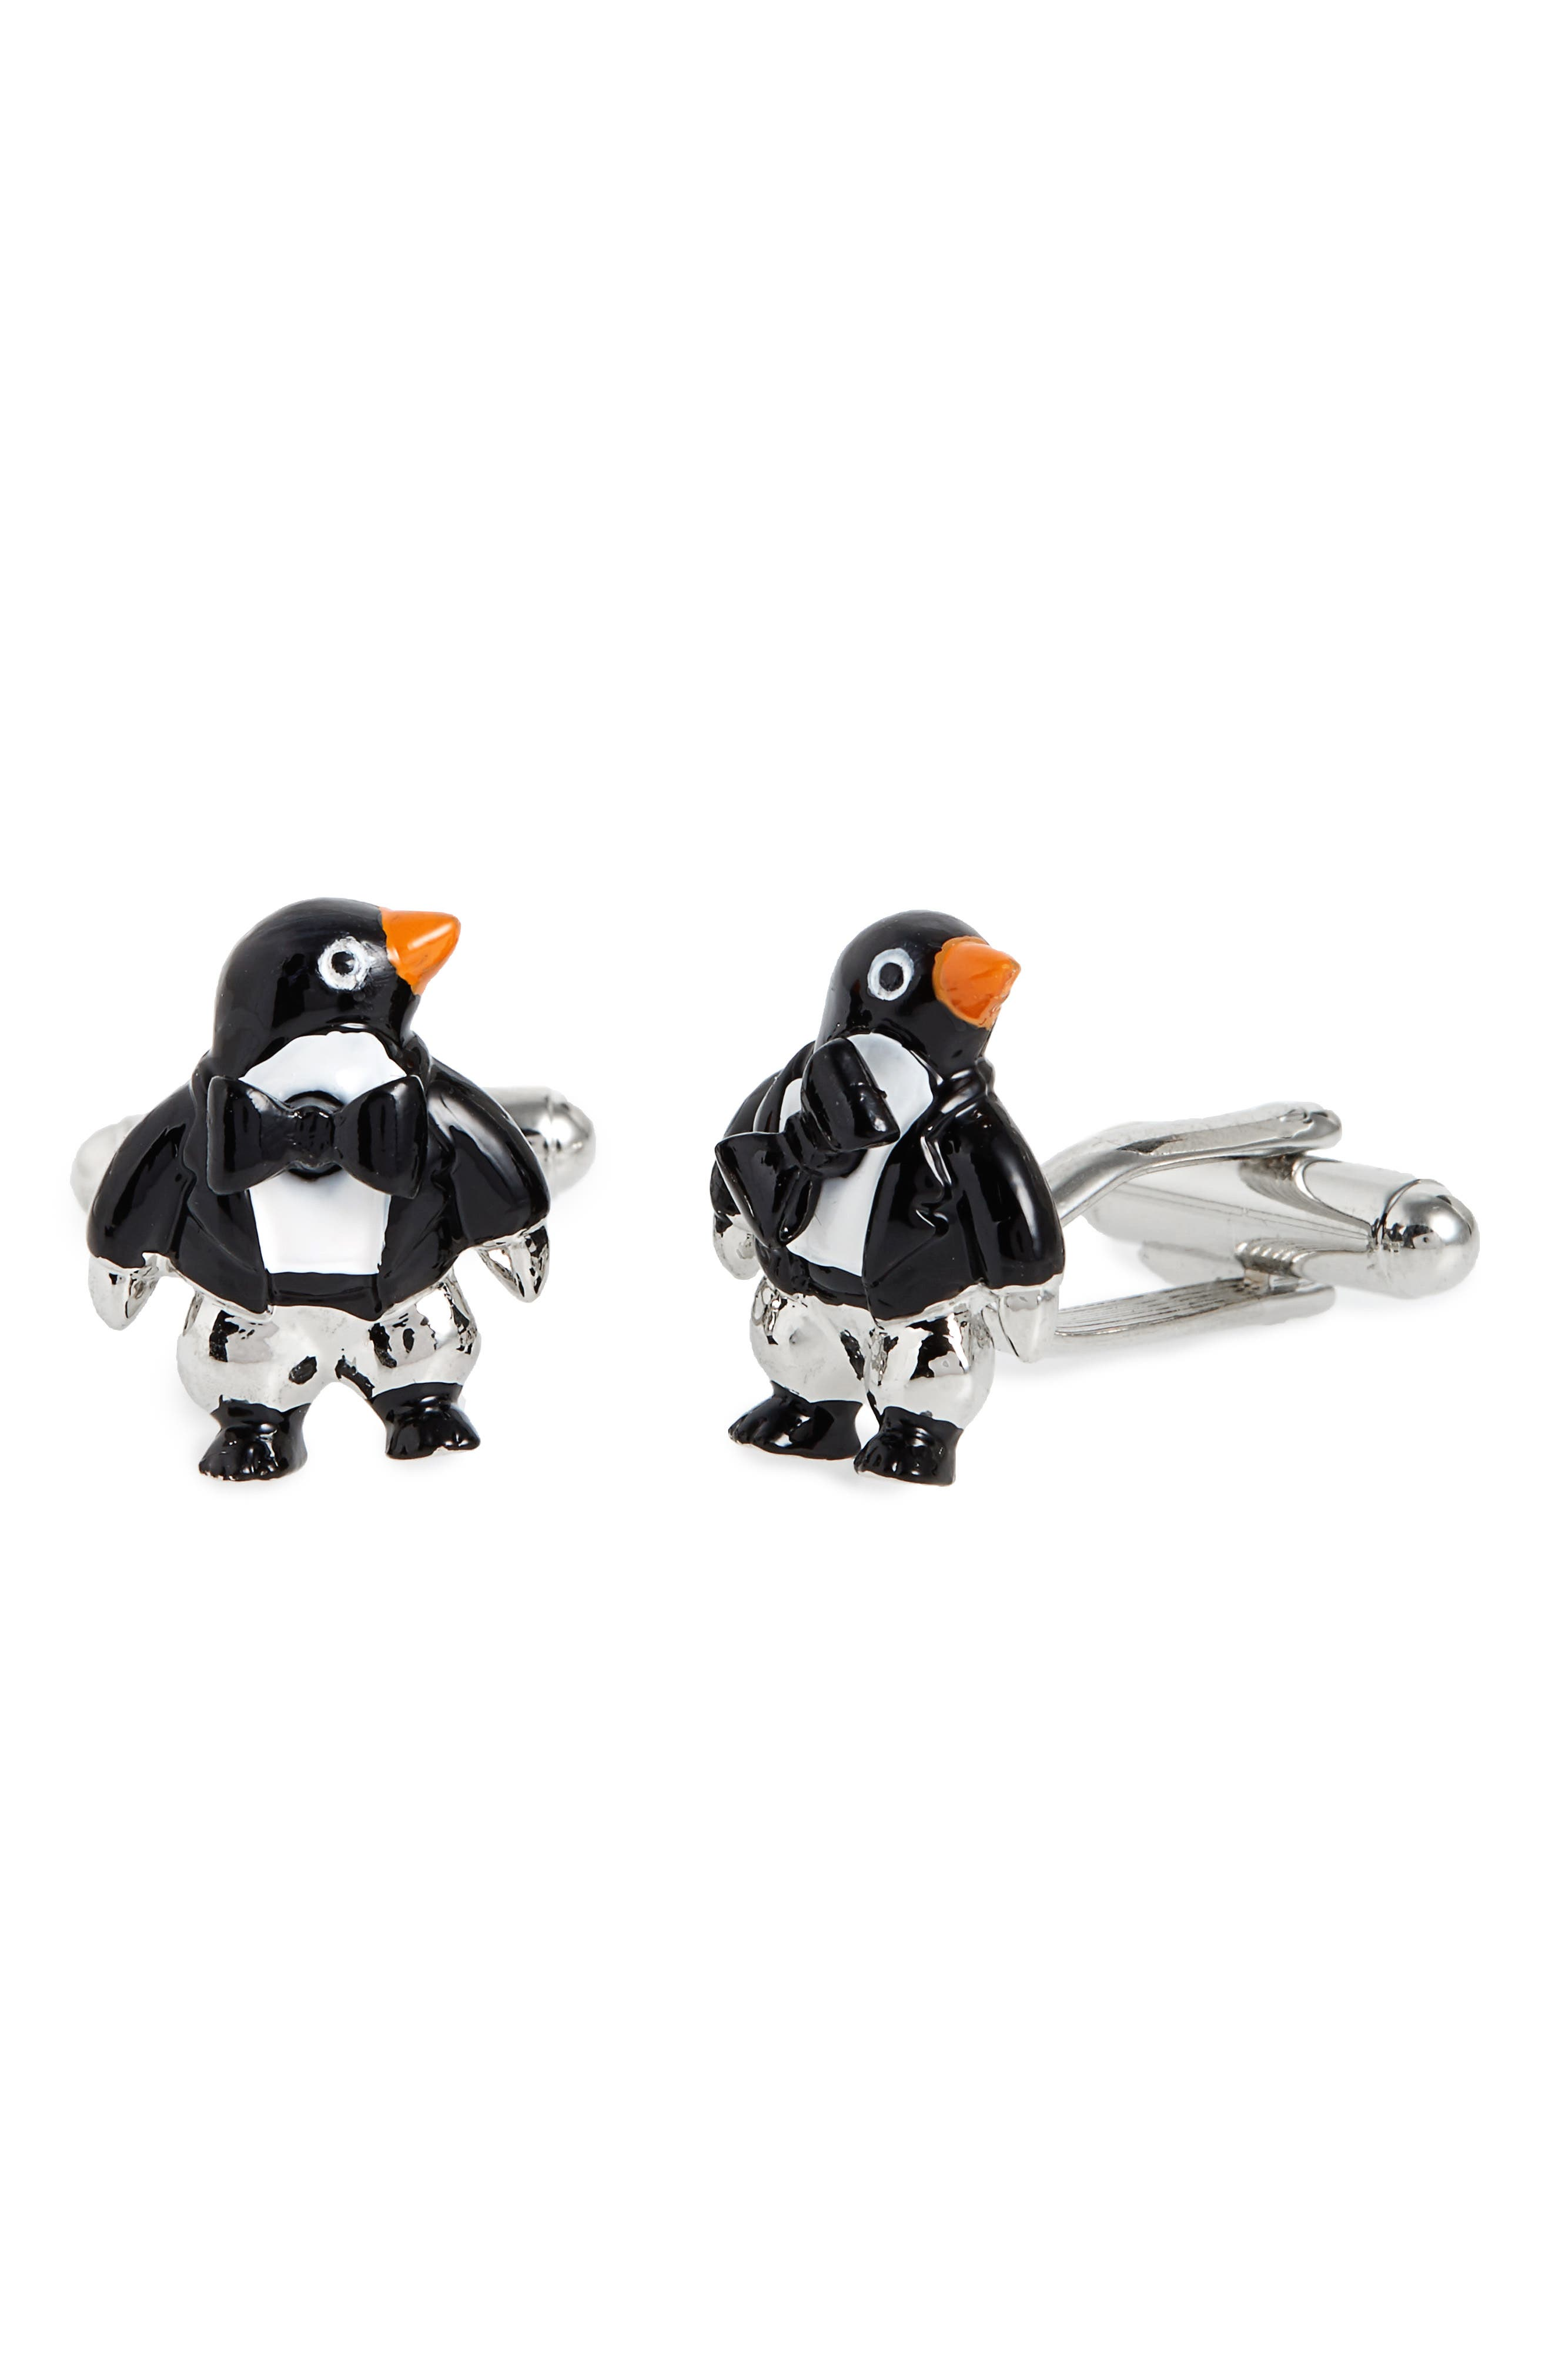 Penguin Cuff Links,                         Main,                         color, Black